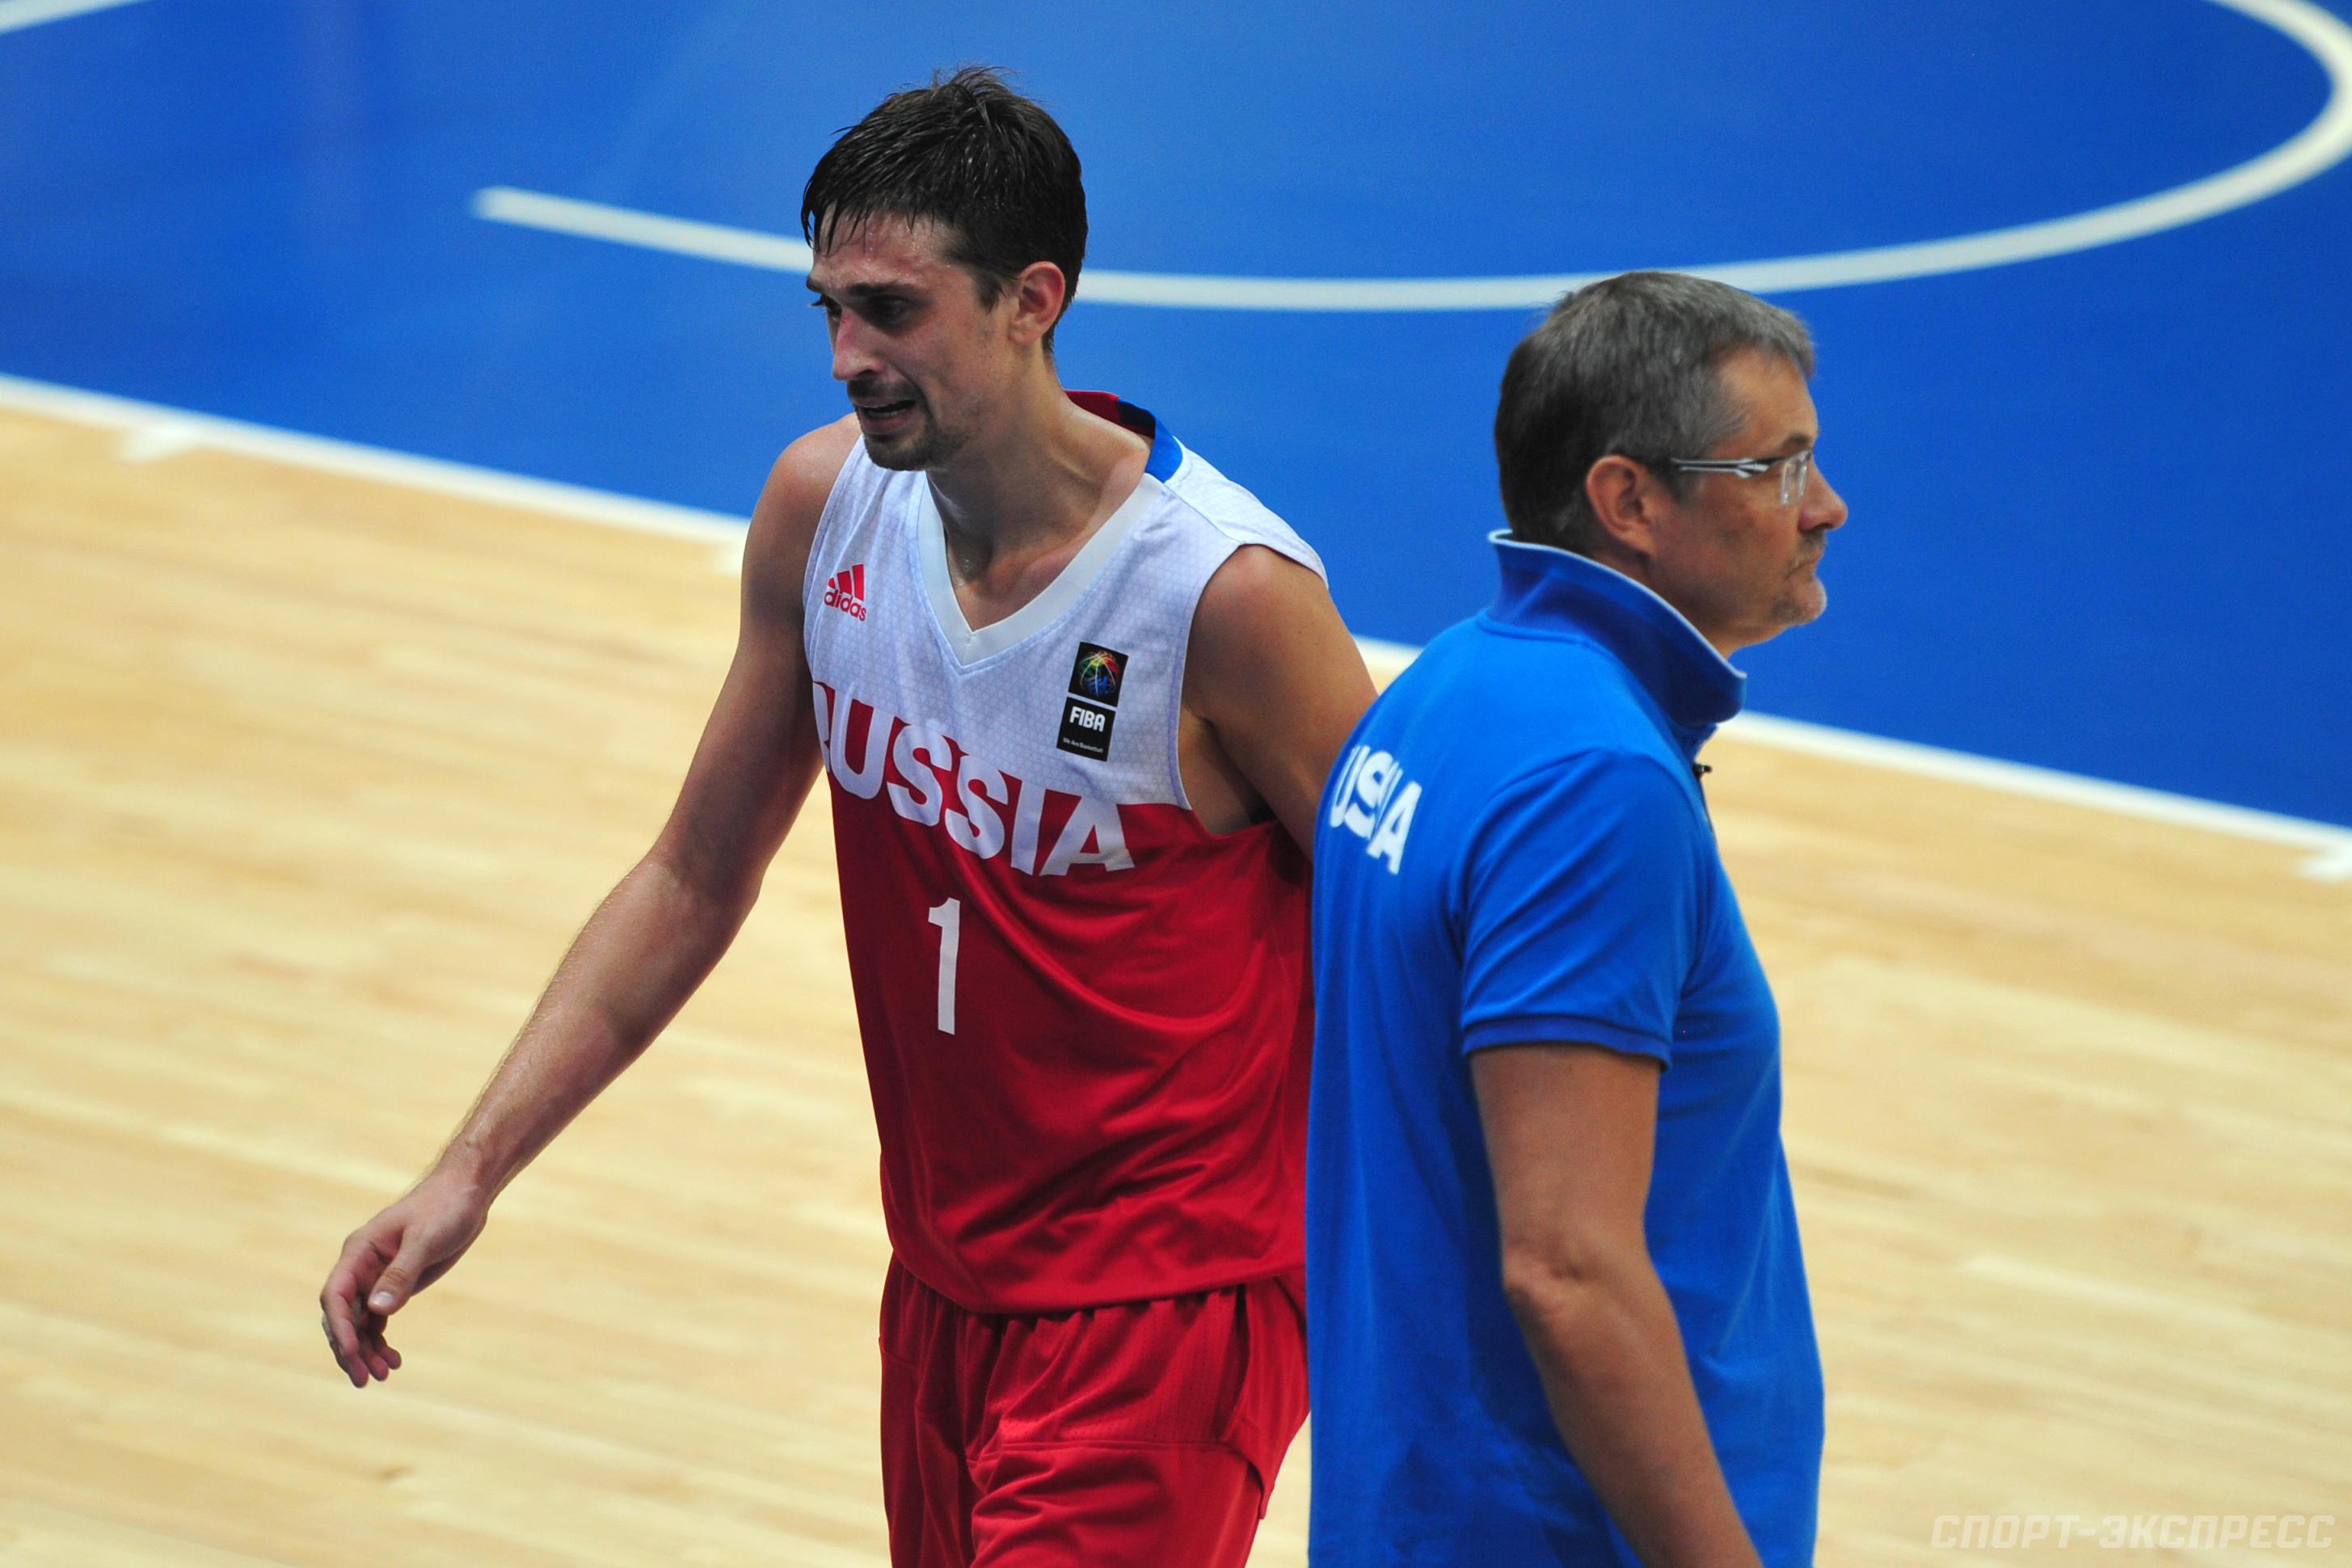 e4b444ce Россия - Чехия. Баскетбол, отборочный турнир чемпионата мира-2019 ...